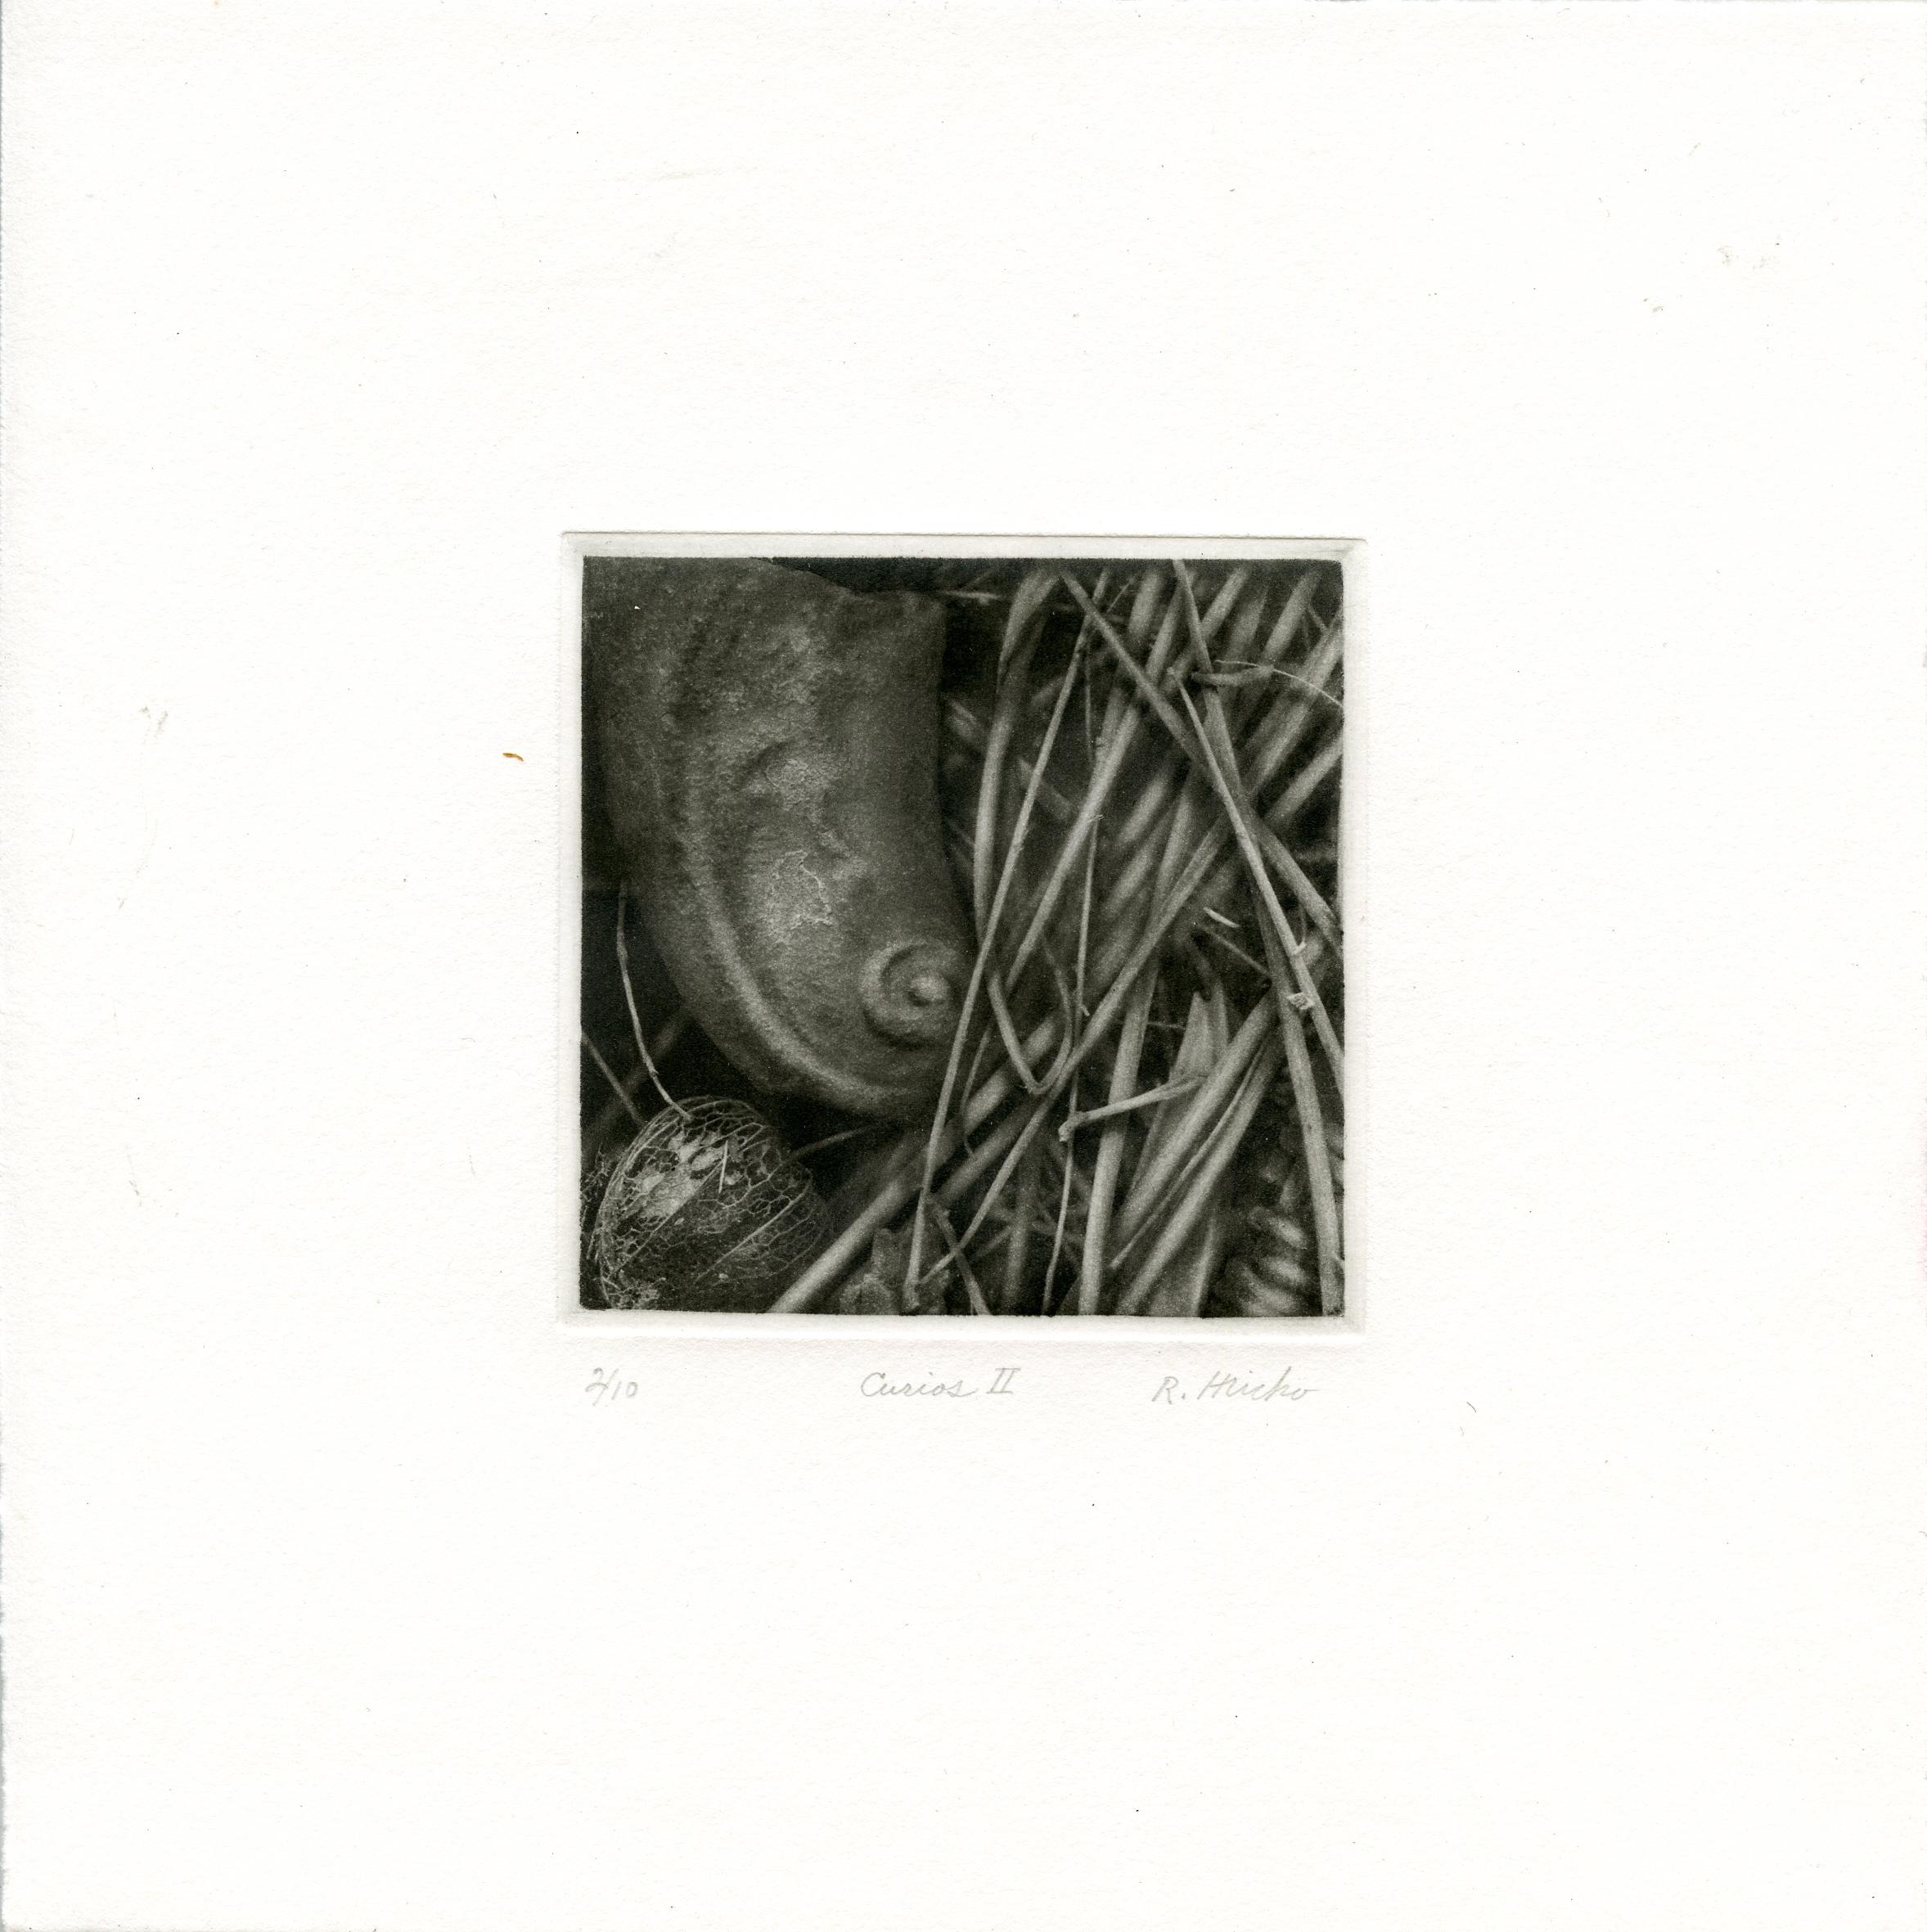 Hricko, Richard: Curios II photogravure